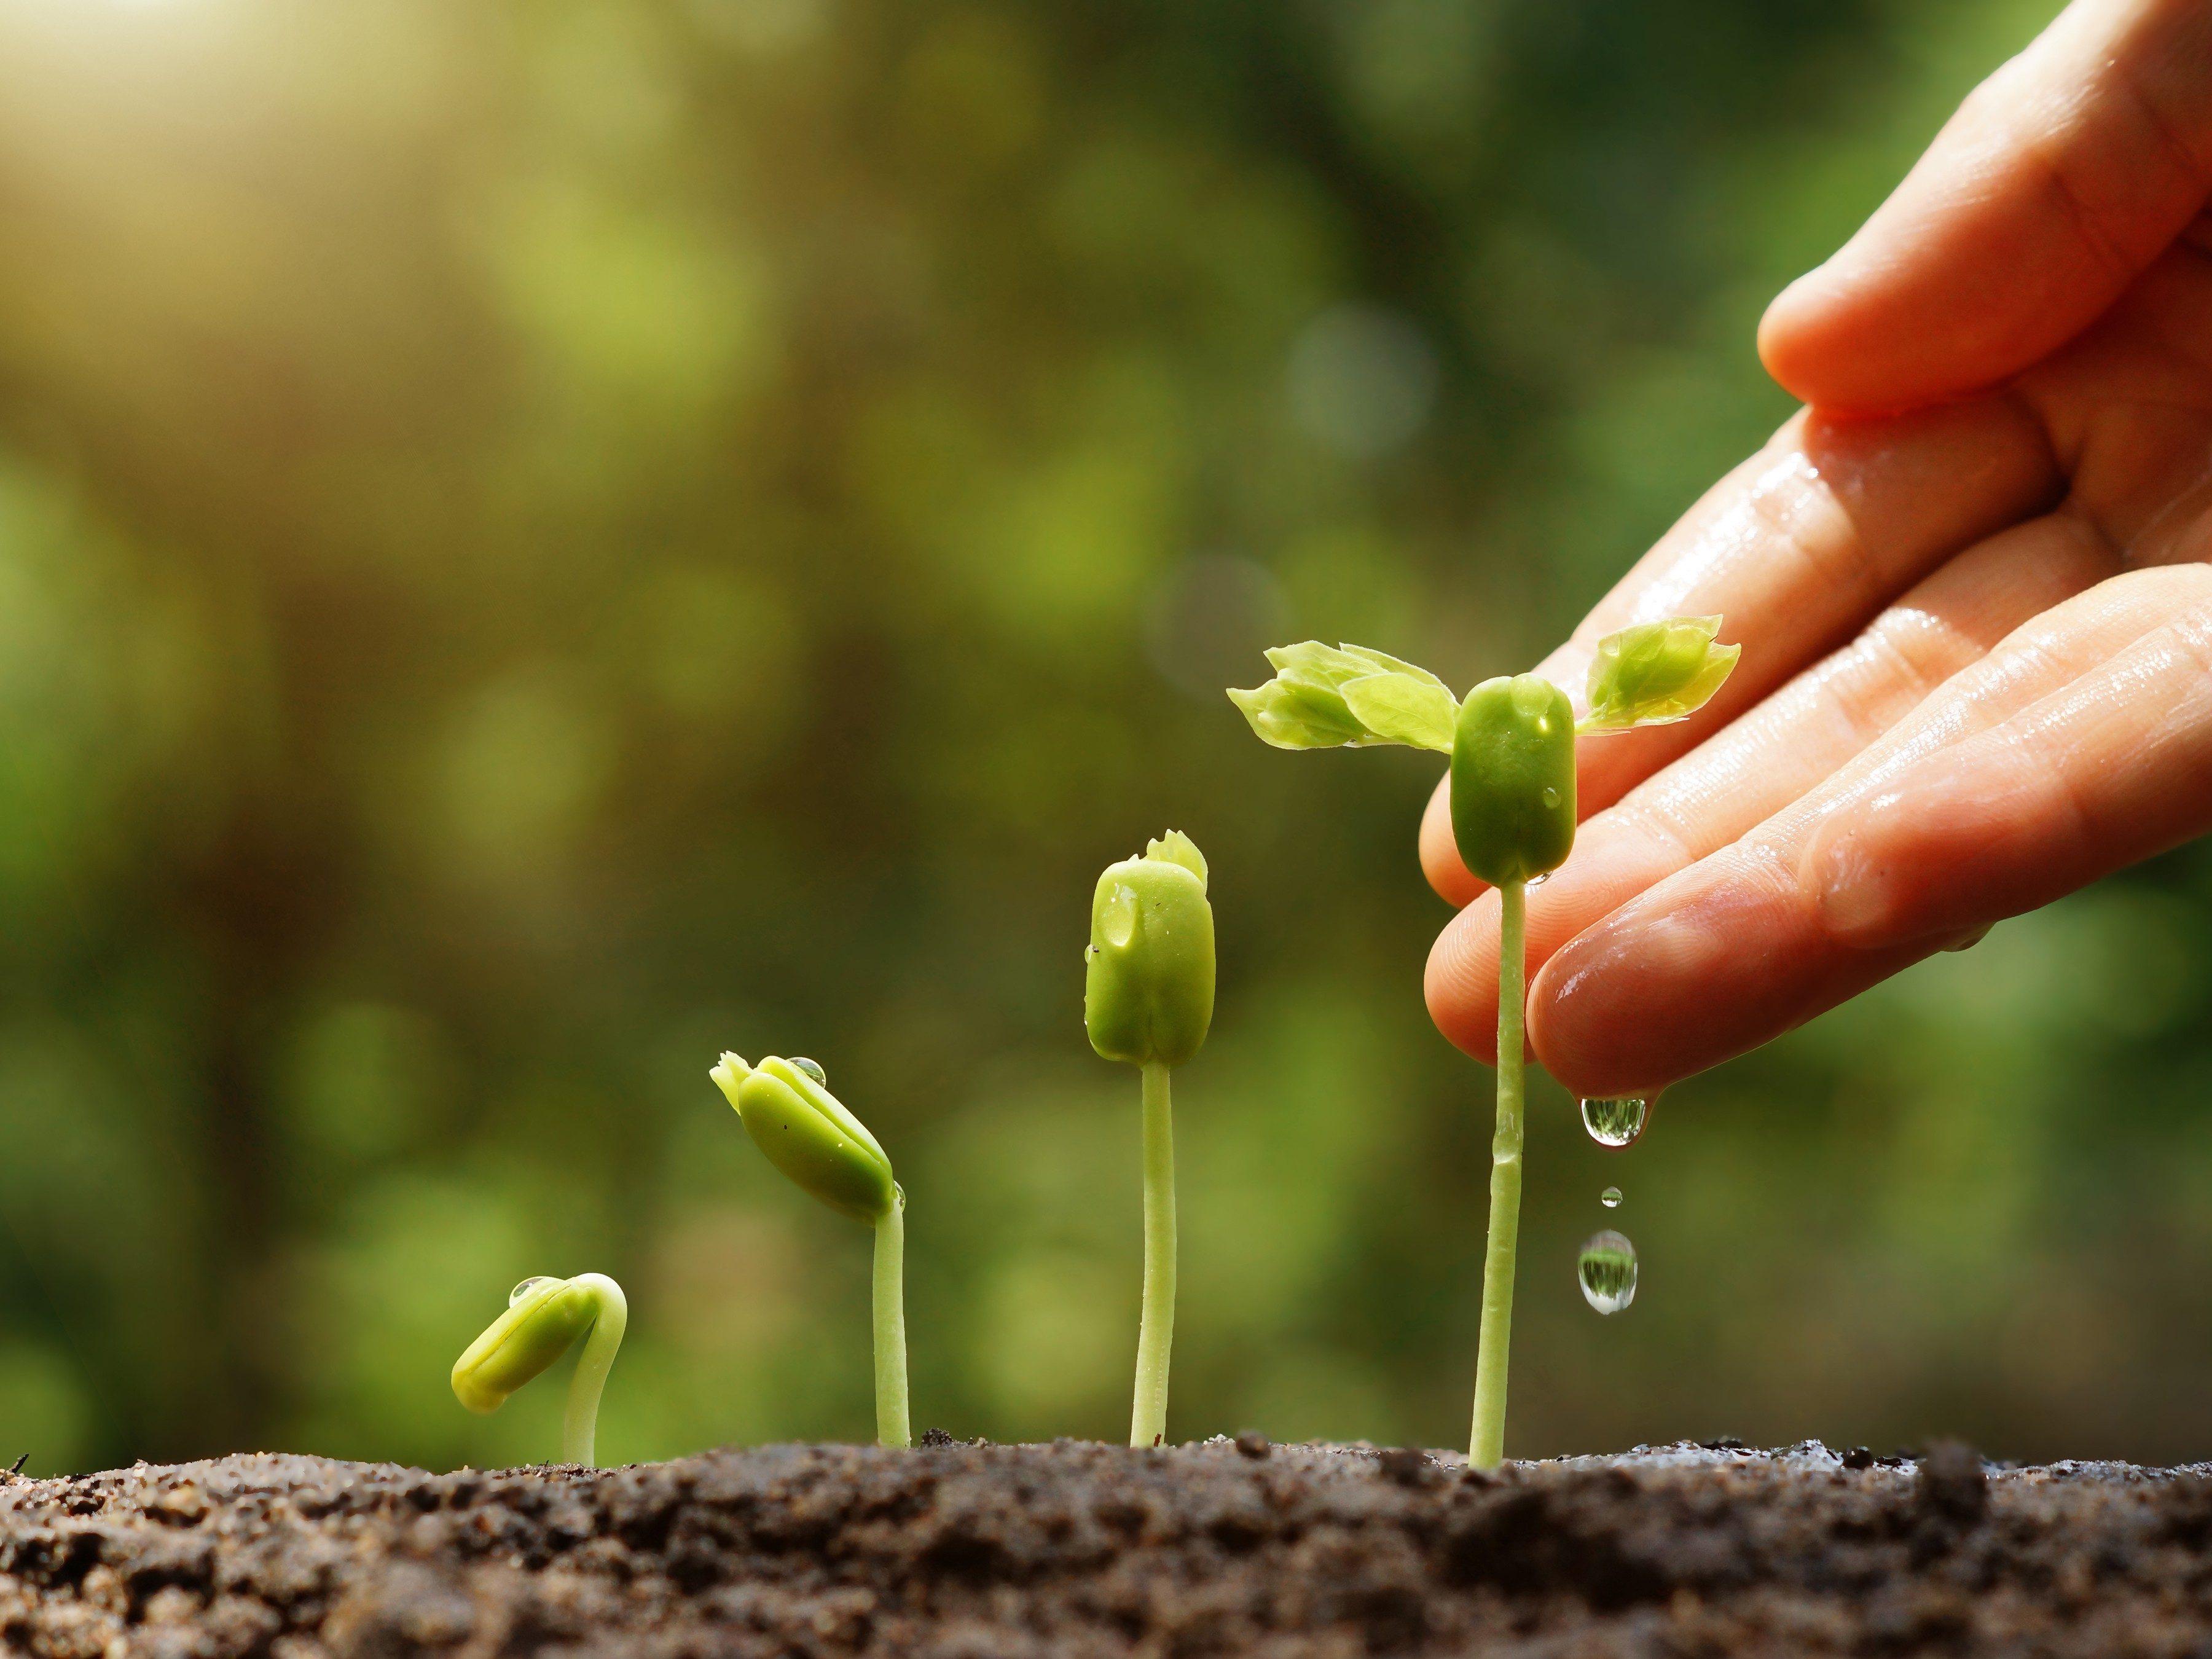 7. Fertilize Your Garden Less